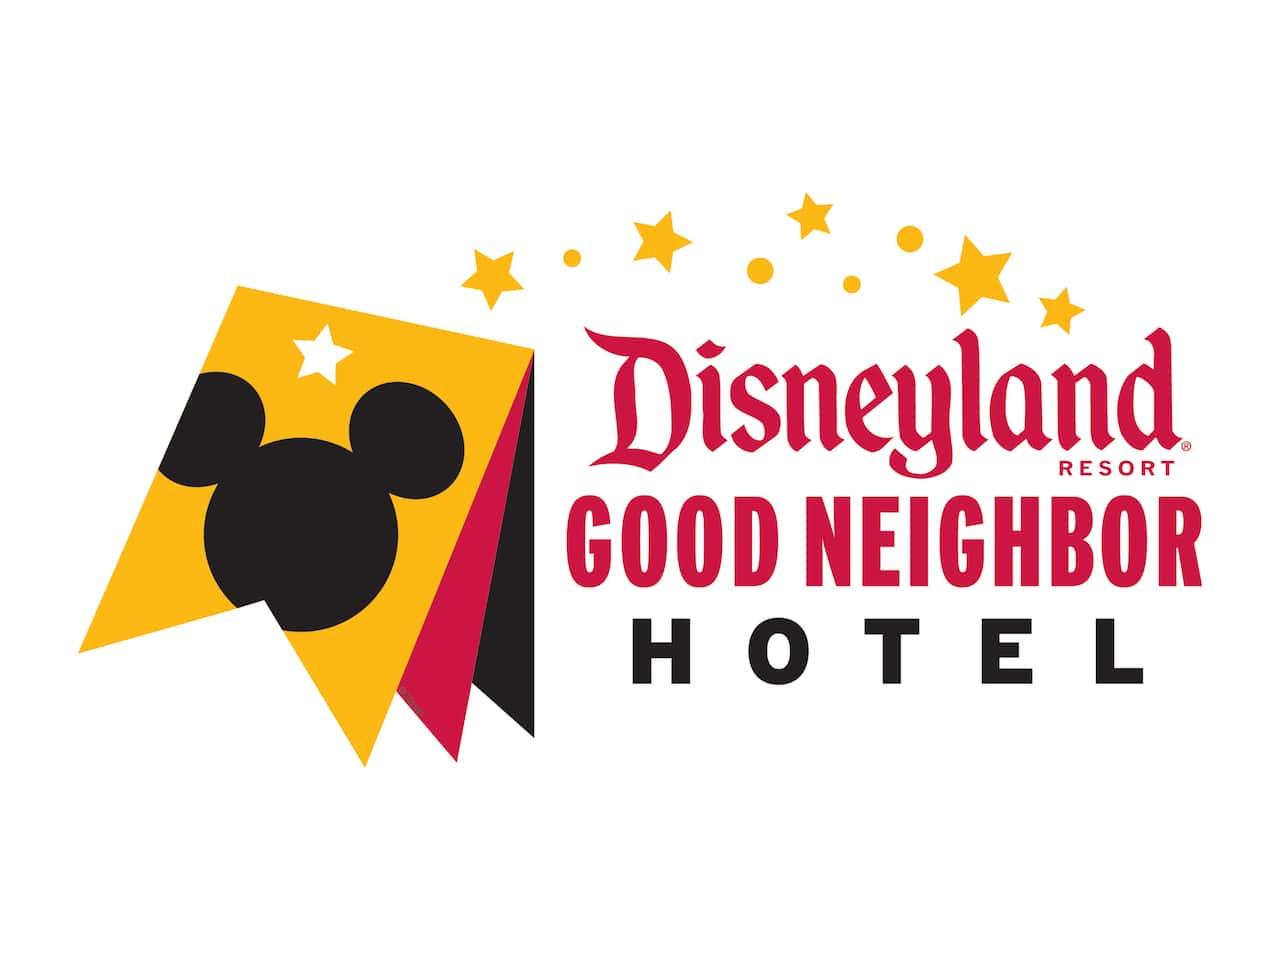 DISNEY-Disneyland-Resort-Good-Neighbor-Hotel